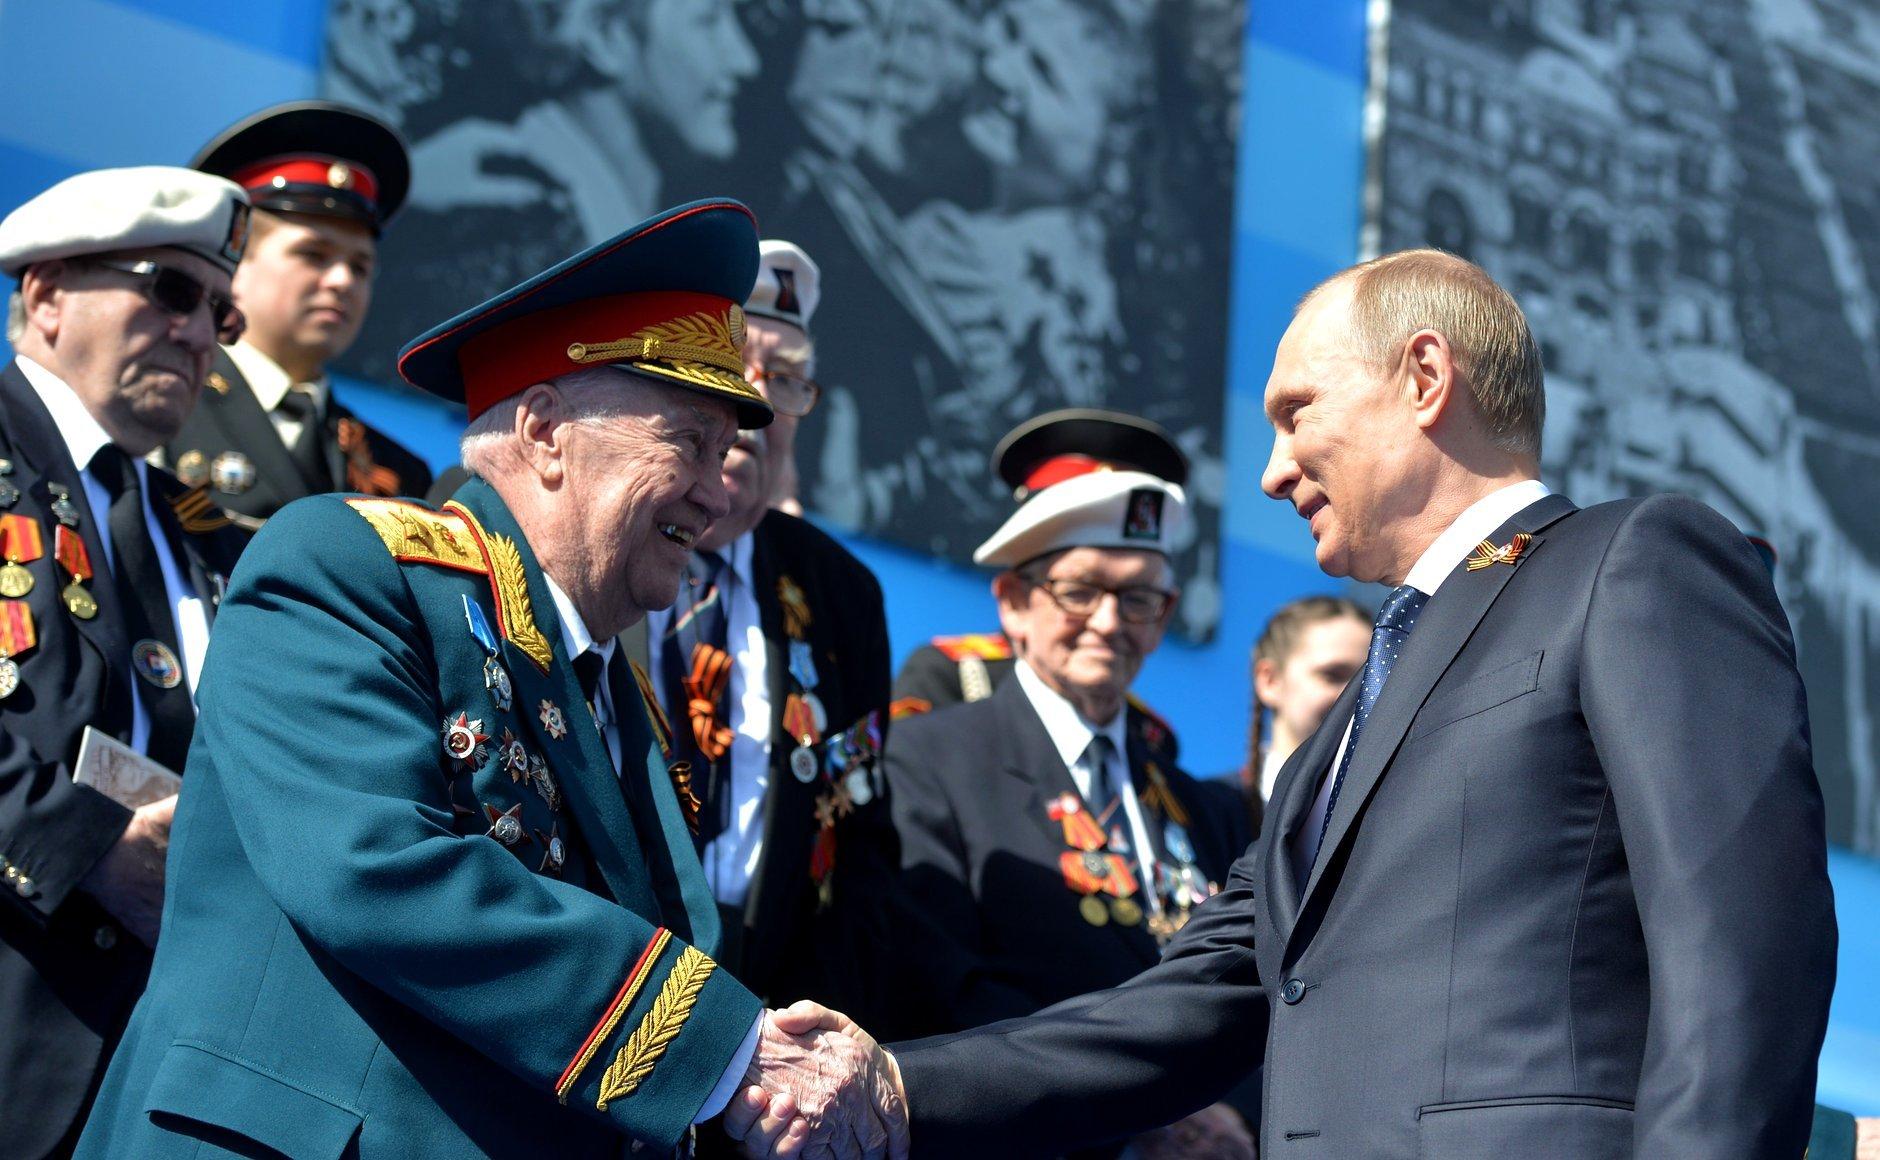 В столице России напараде охрана В. Путина оттолкнула ветерана